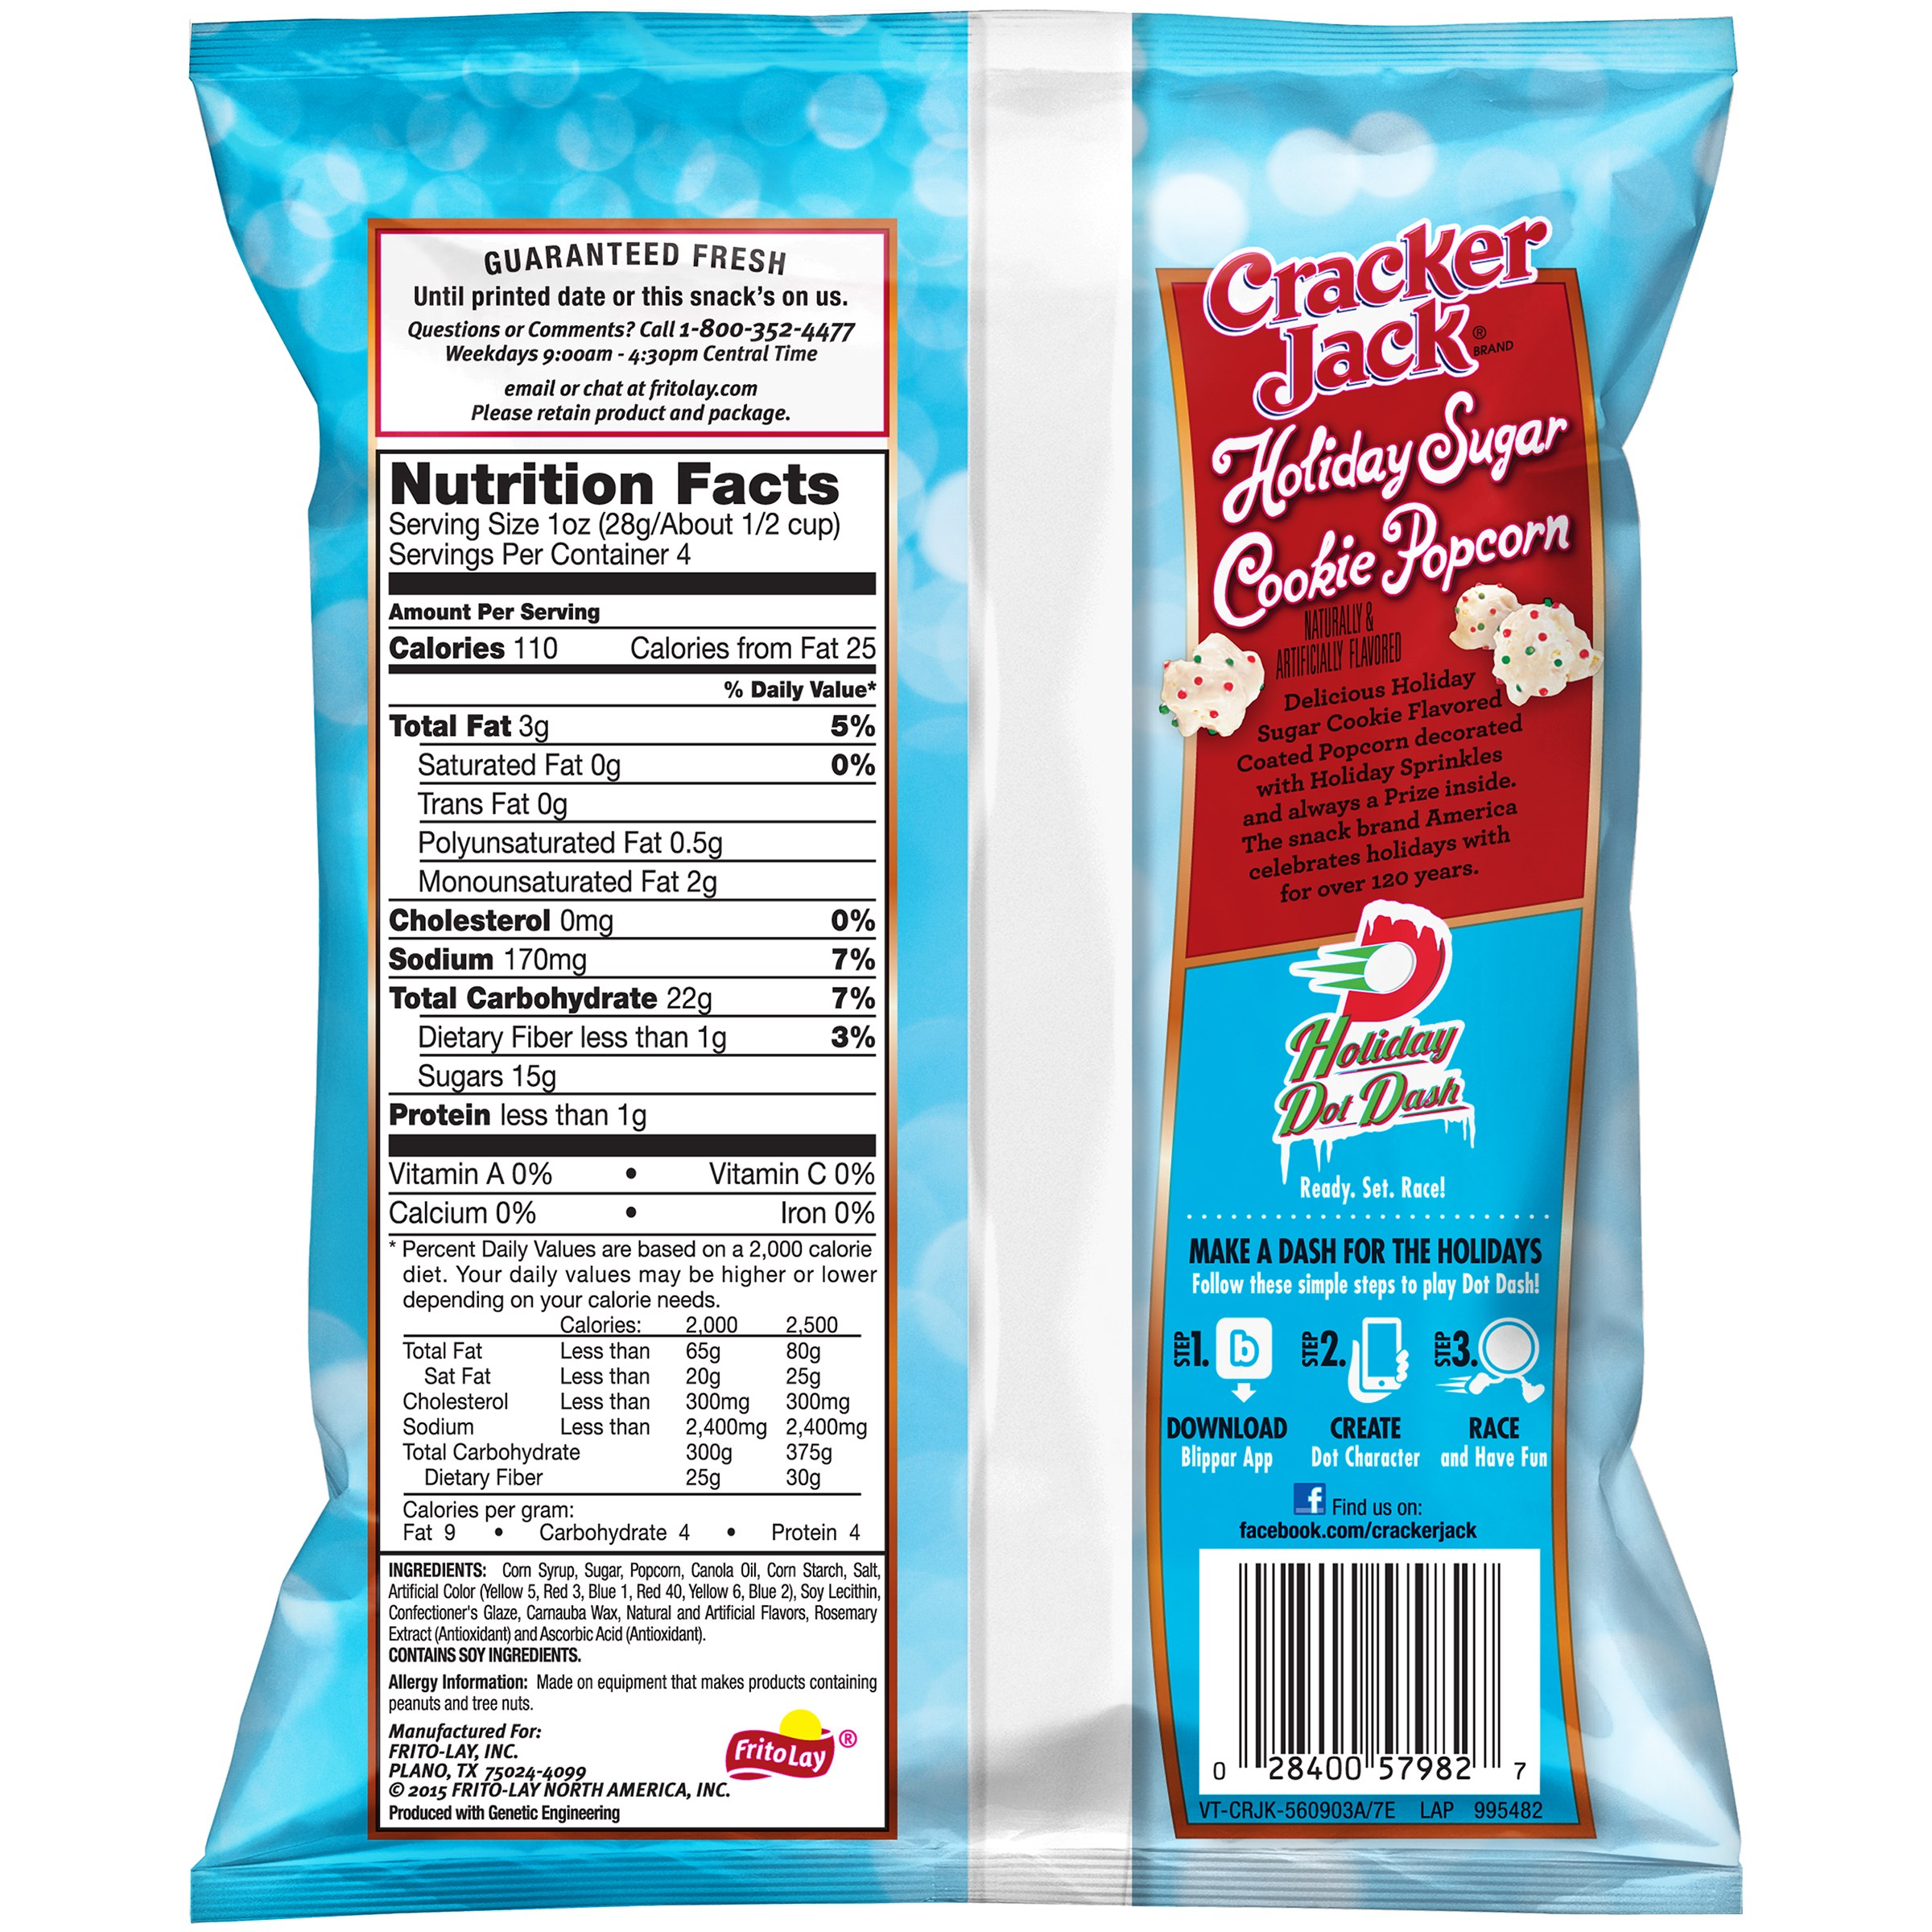 Cracker Jack? Holiday Sugar Cookie Popcorn 4 oz. Box - Walmart.com